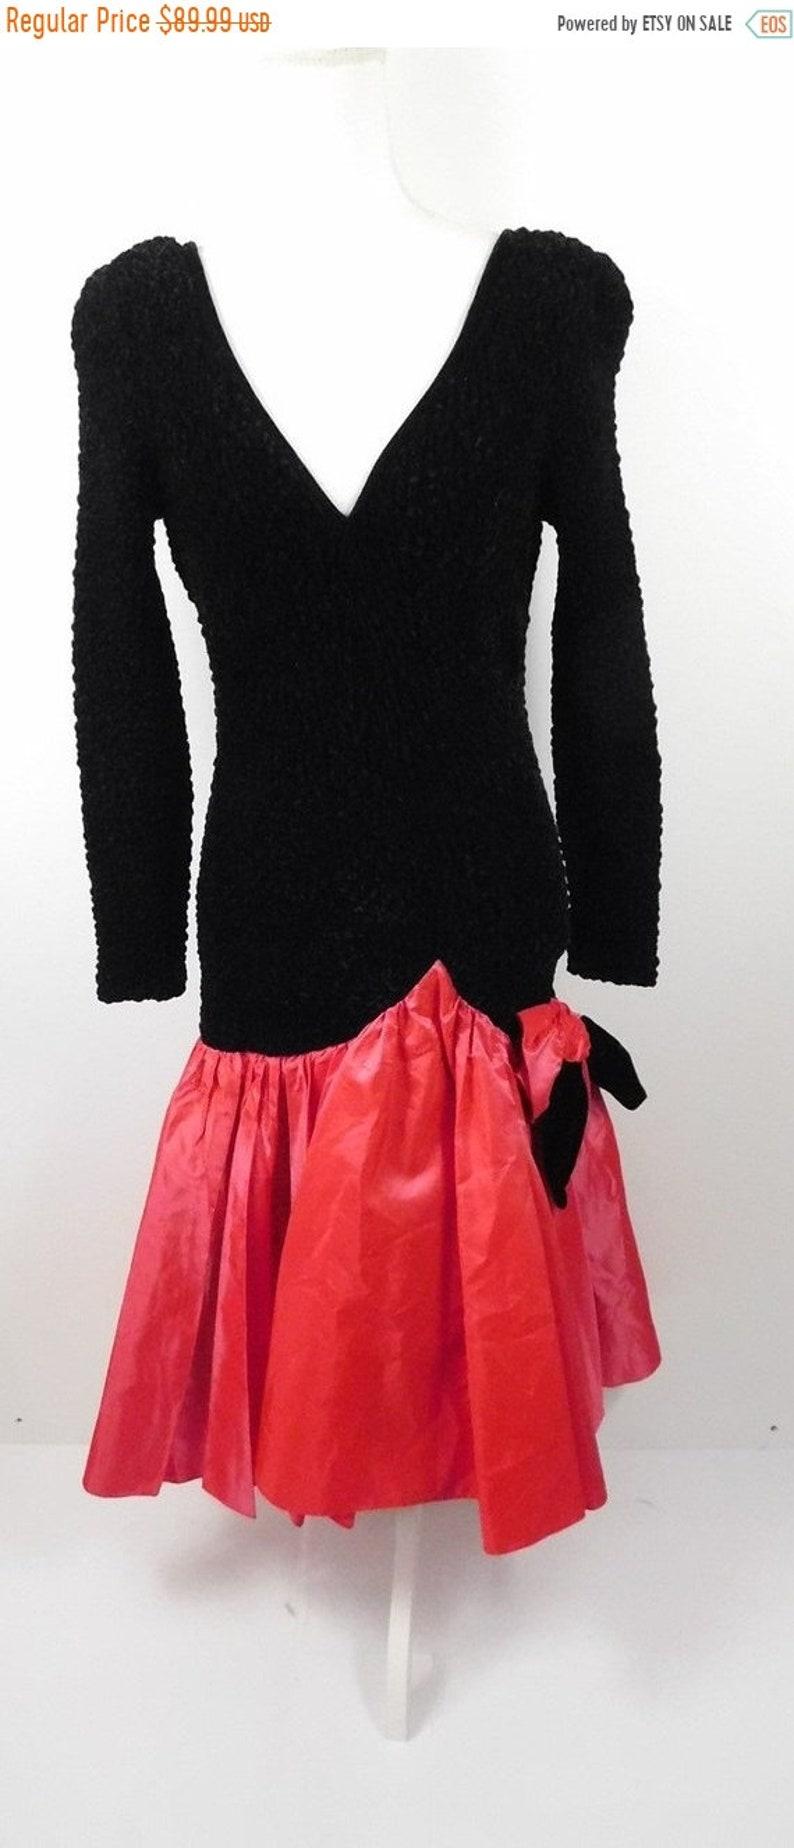 5123174c70ef 40% OFF BLOWOUT SALE Vintage Cache Black Pink Shiny Metallic | Etsy